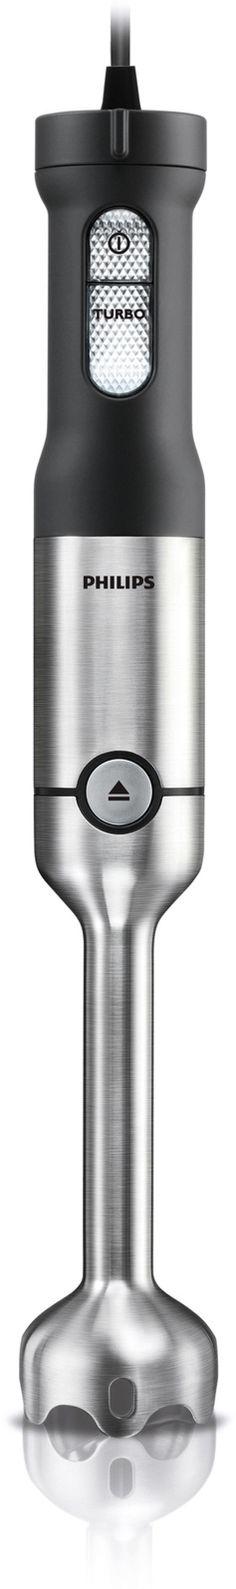 Avance by Philips Product Design Id Design, Pattern Design, Hand Blender, Philips, Bottle Design, Looks Cool, Textures Patterns, Kitchenware, Industrial Design